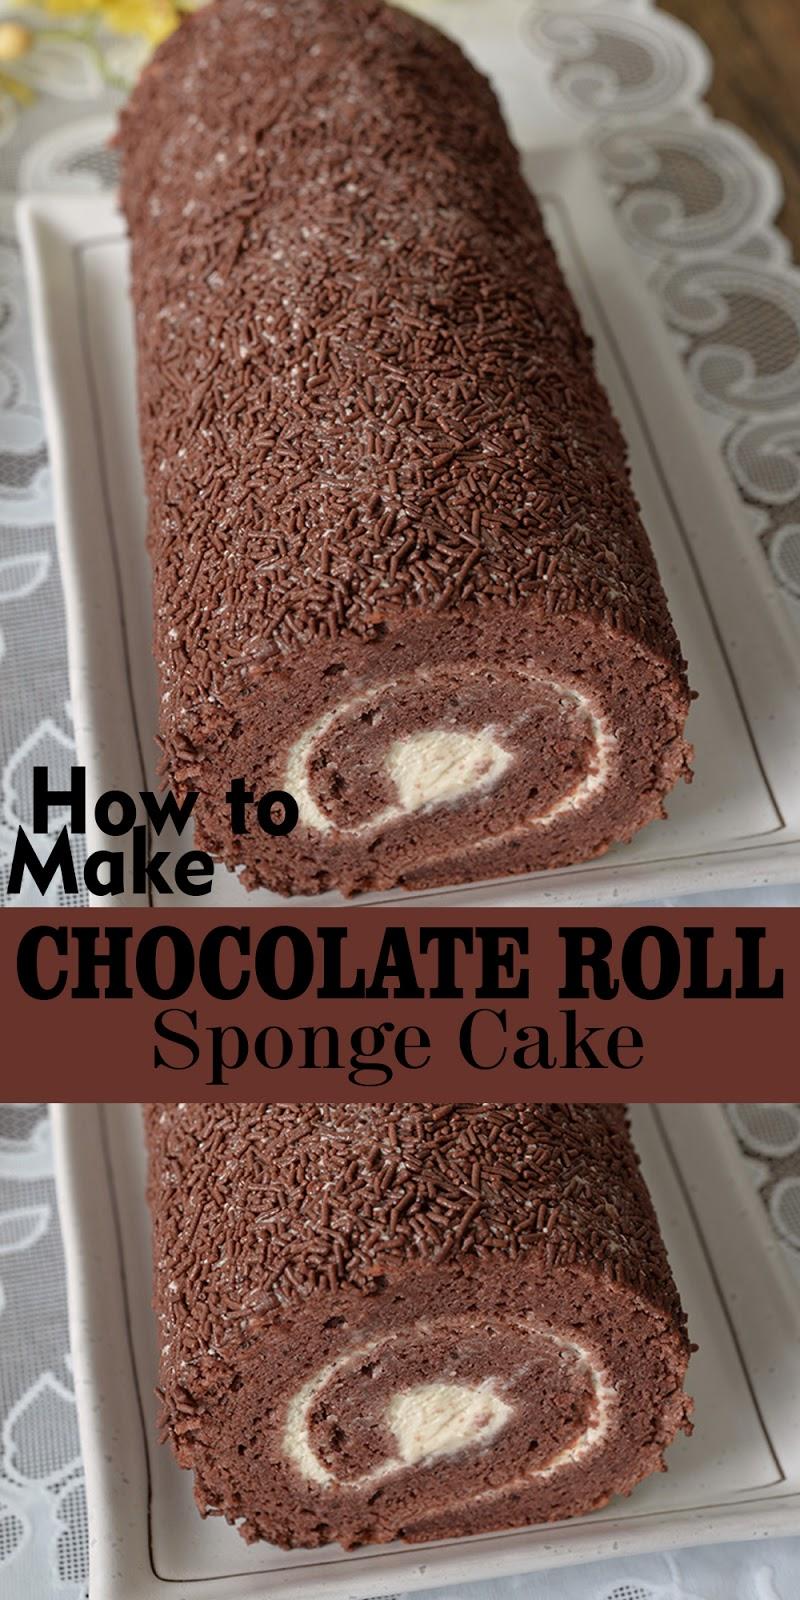 CHOCOLATE ROLL SPONGE CAKE